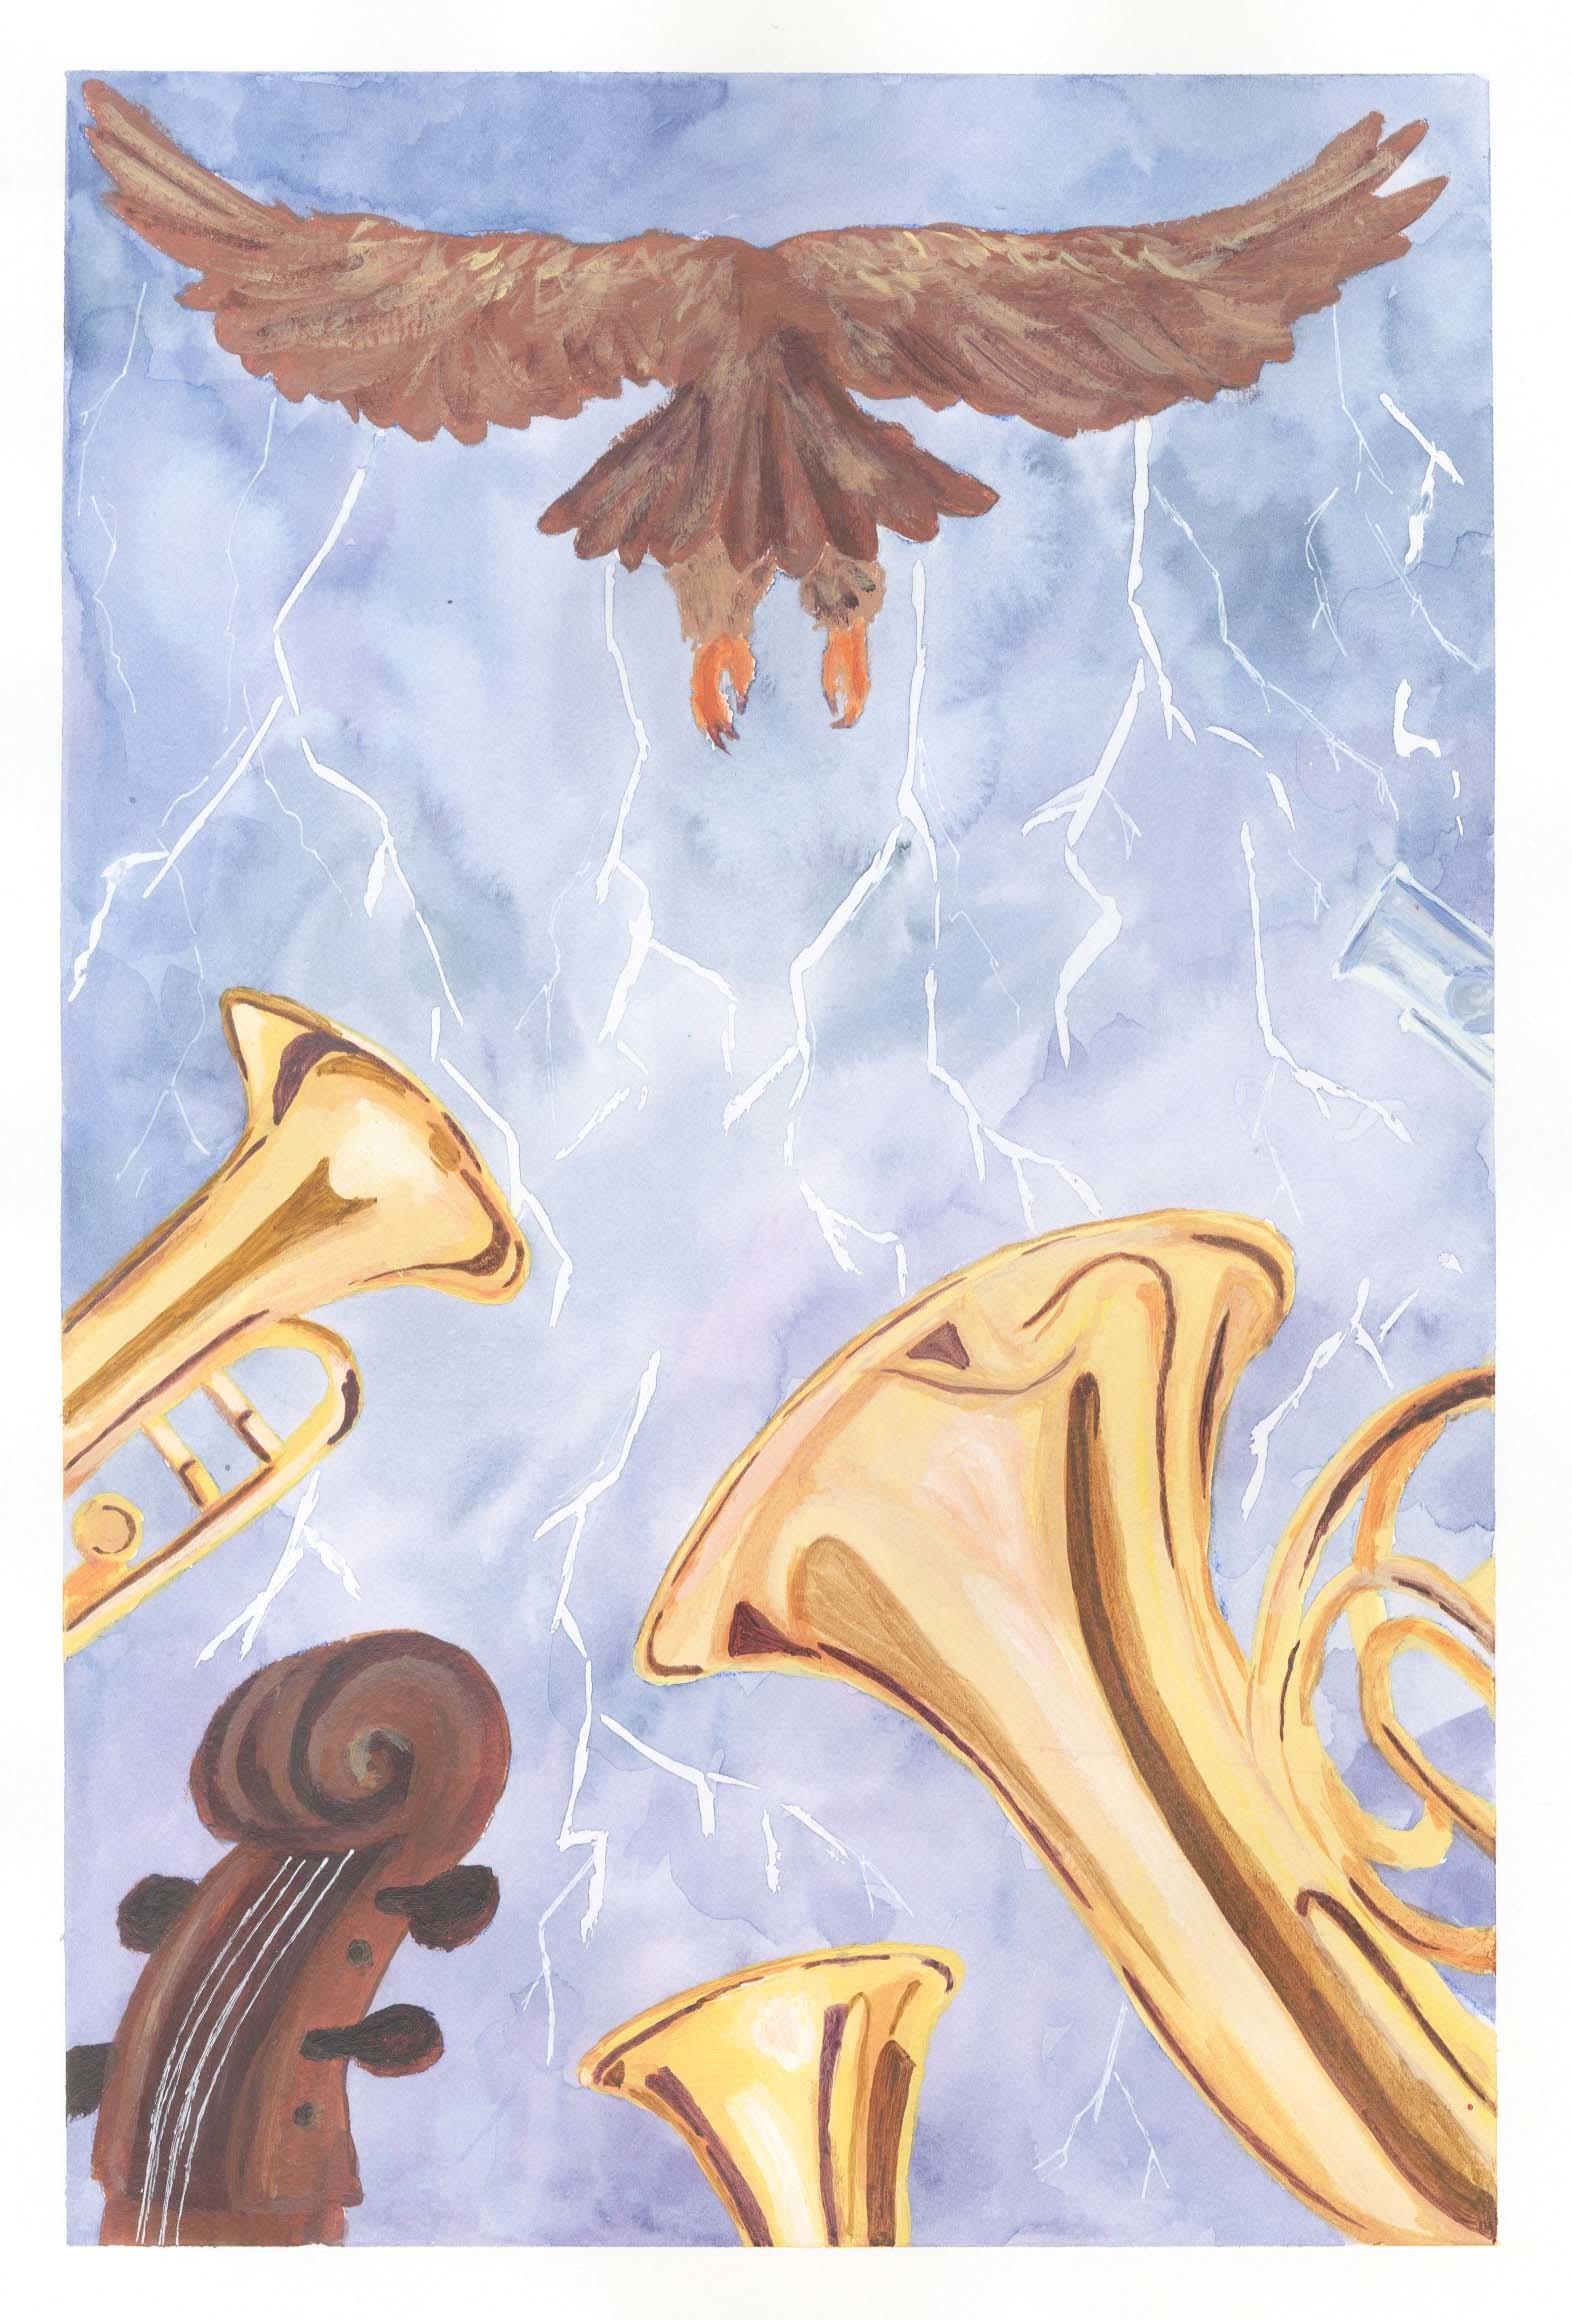 Semele student artwork from MassArt, McDonald